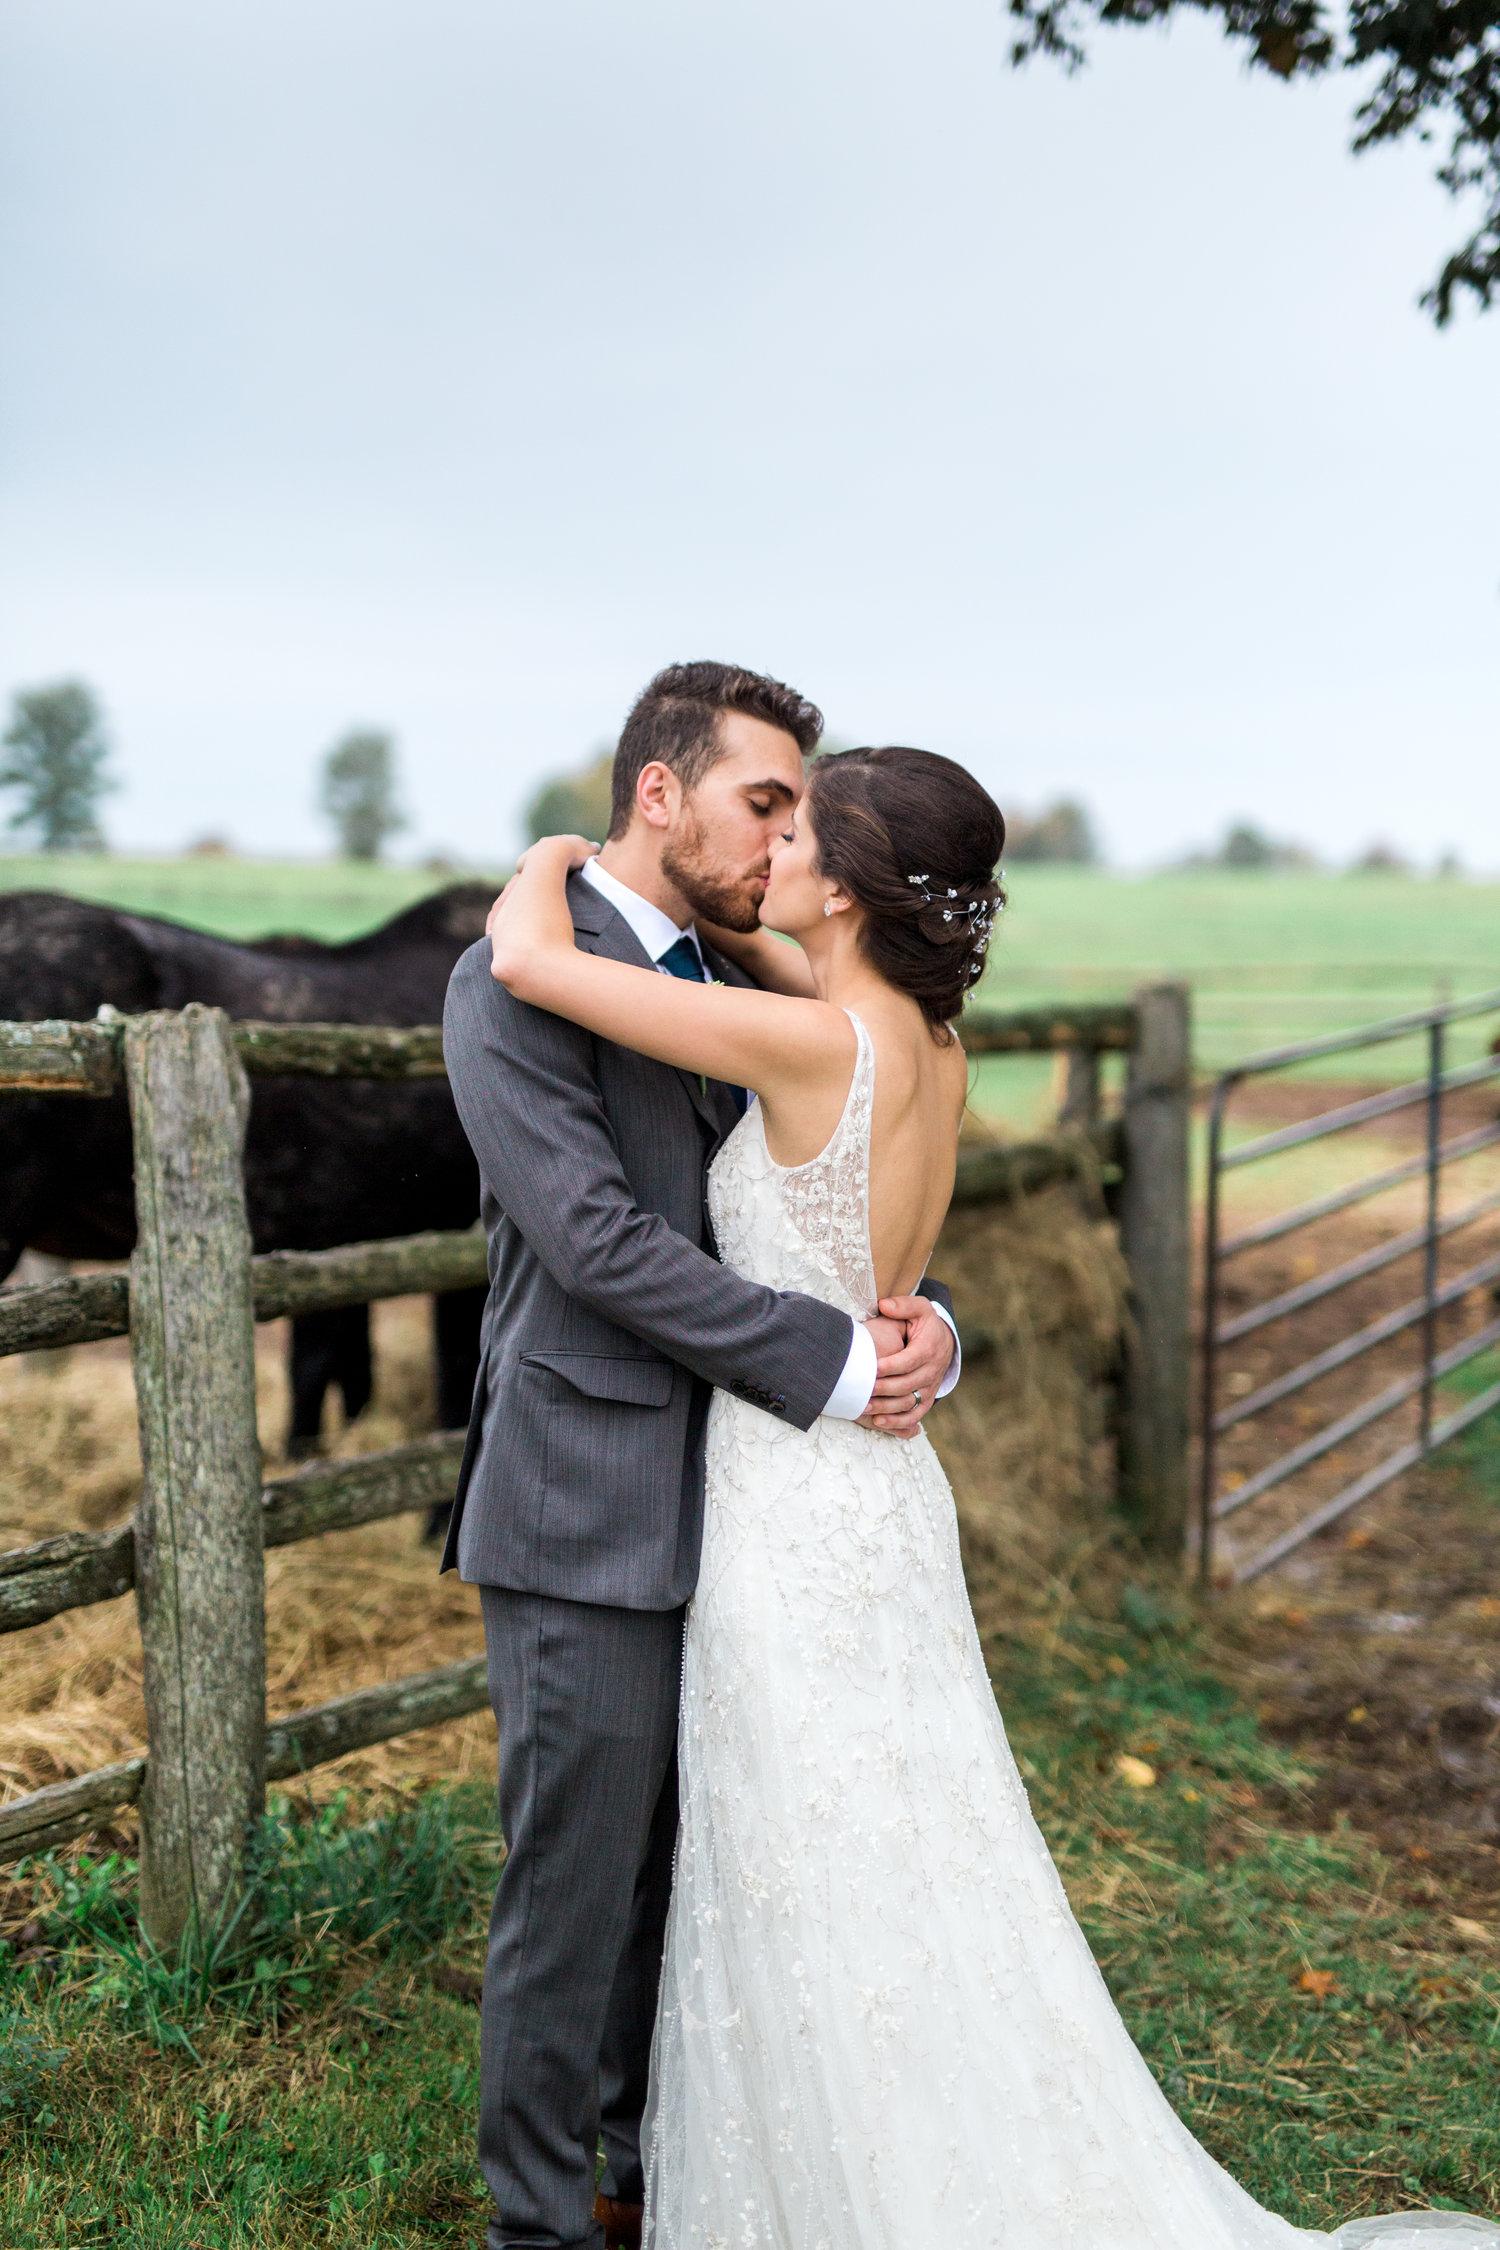 Amir-Golbazi-Danielle-Giroux-Photography_Toronto-Wedding_Cedarwood_Rachel-Paul_500.jpg